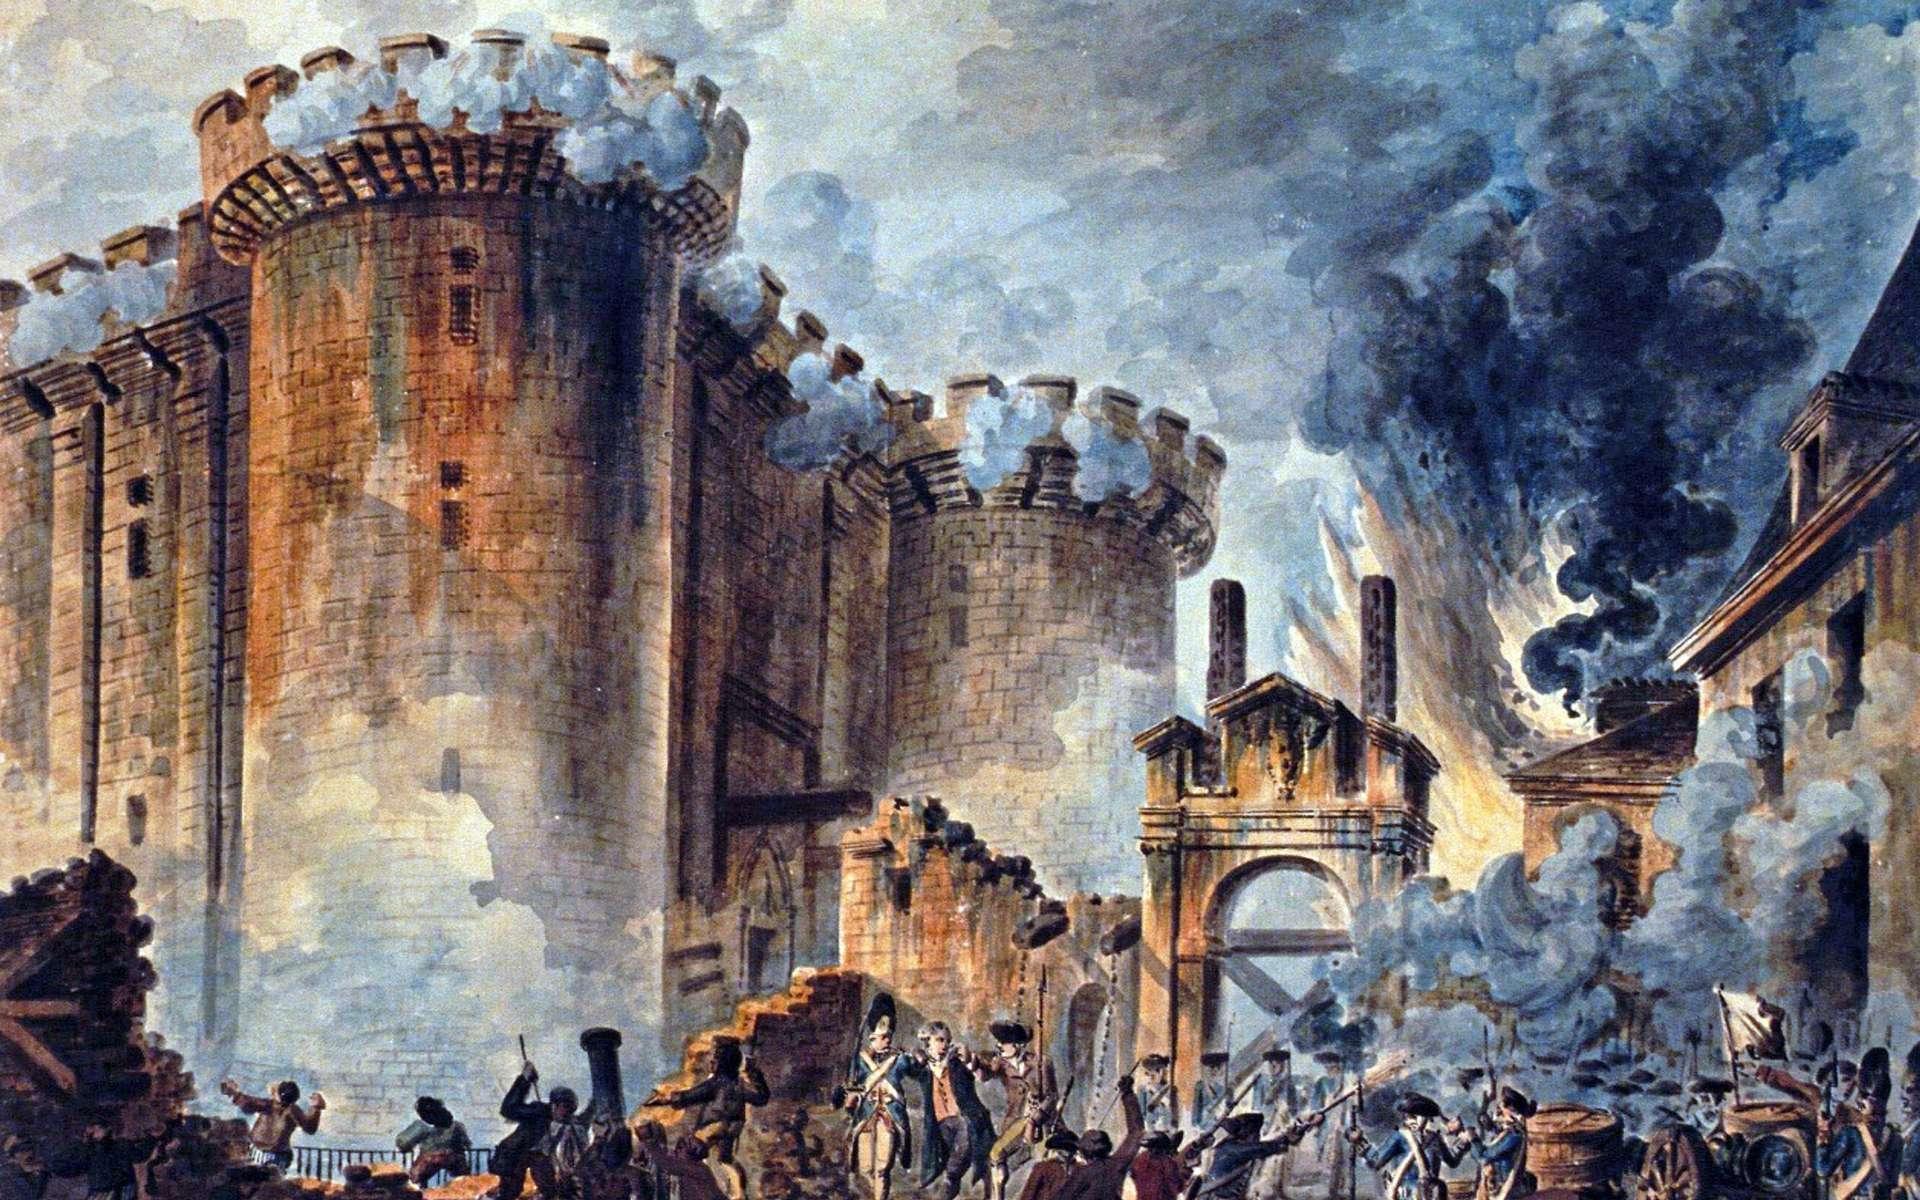 Tableau de Jean-Pierre Houël de la prise de la Bastille. © Jean-Pierre Houël, Wikimedia Commons, Domaine Public